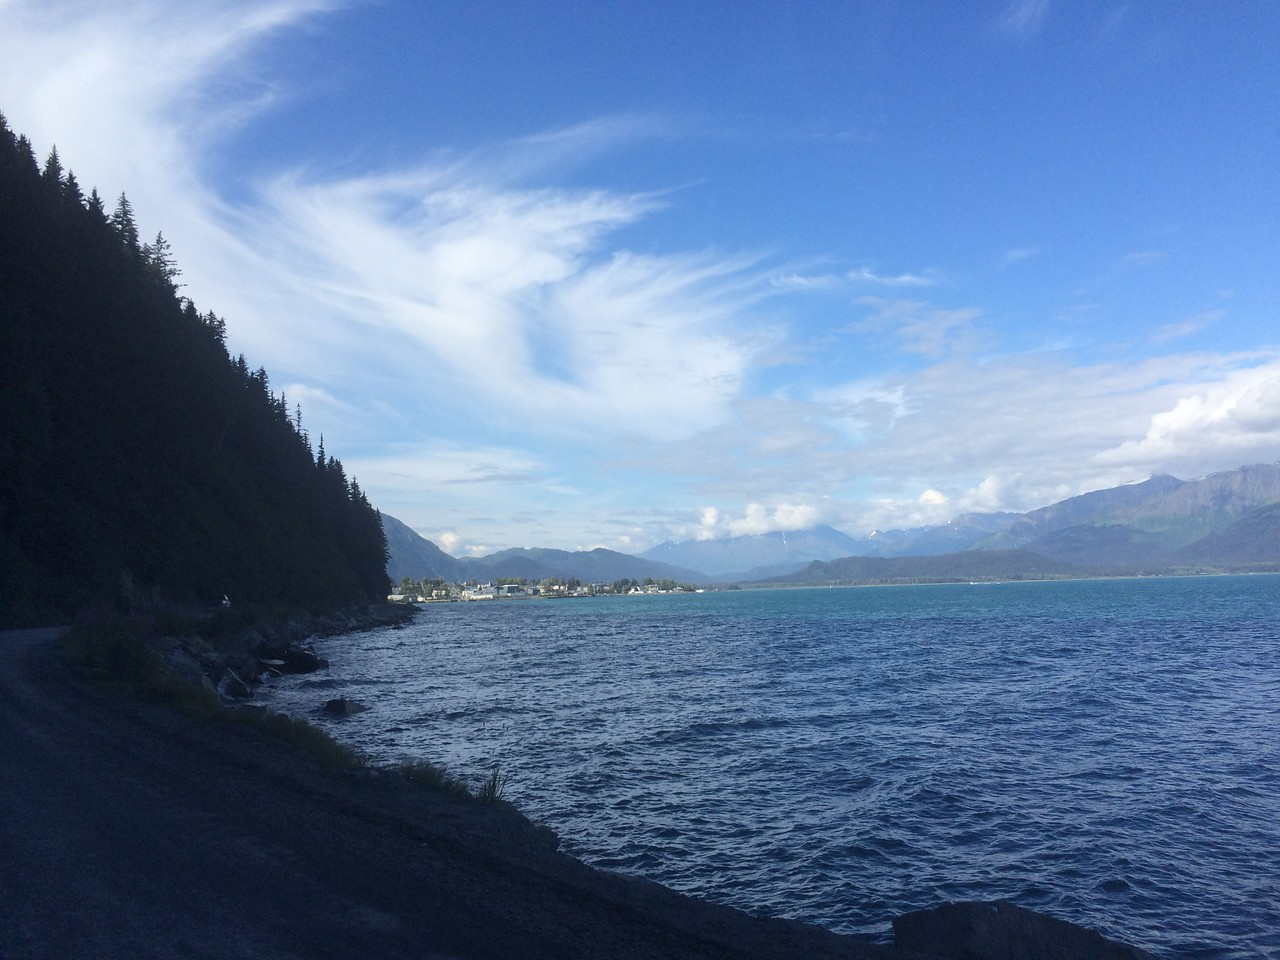 A view back toward town: Seward, Alaska.